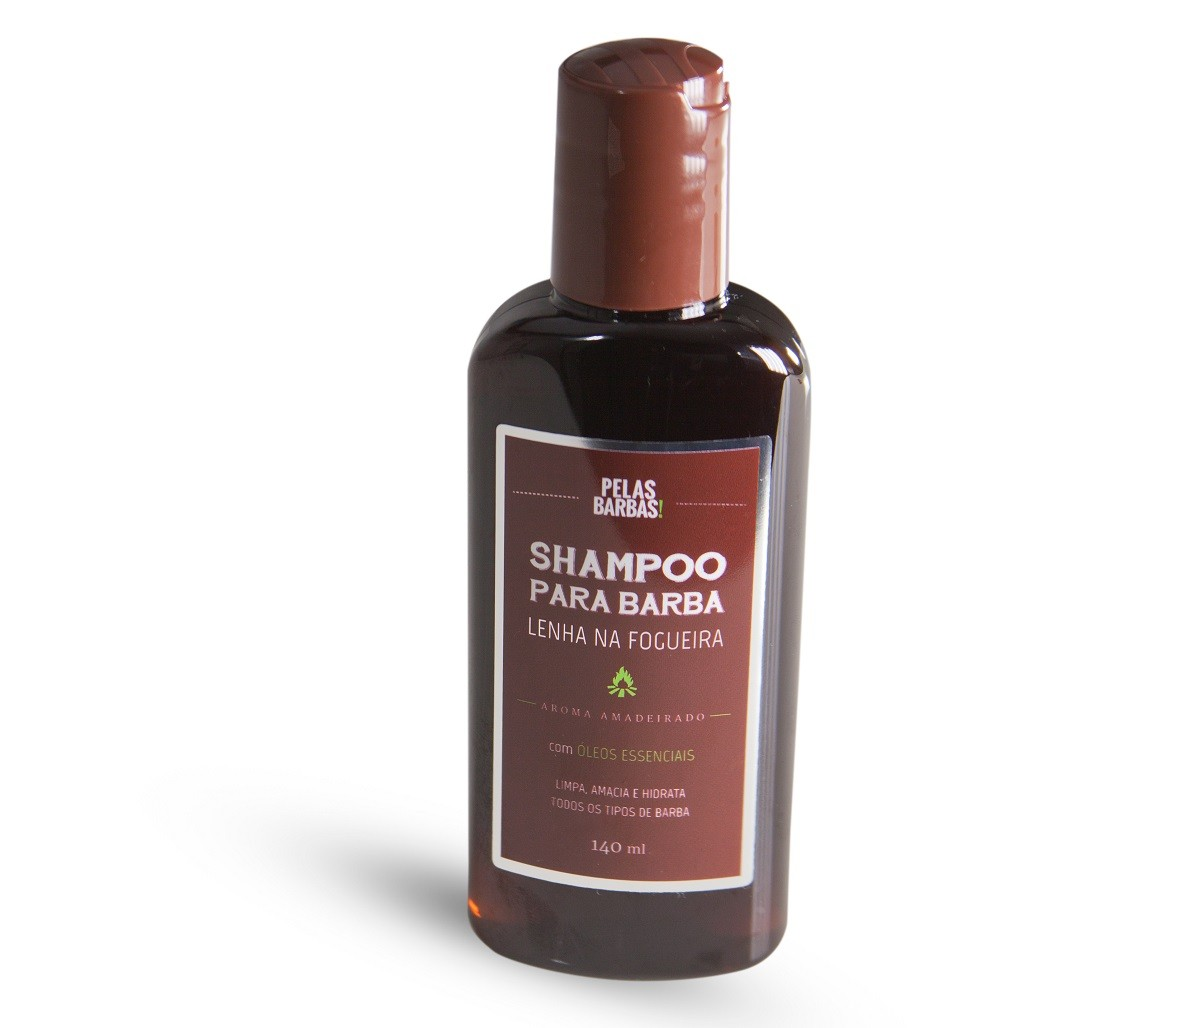 Shampoo de Barba Lenha na Fogueira - 140mL